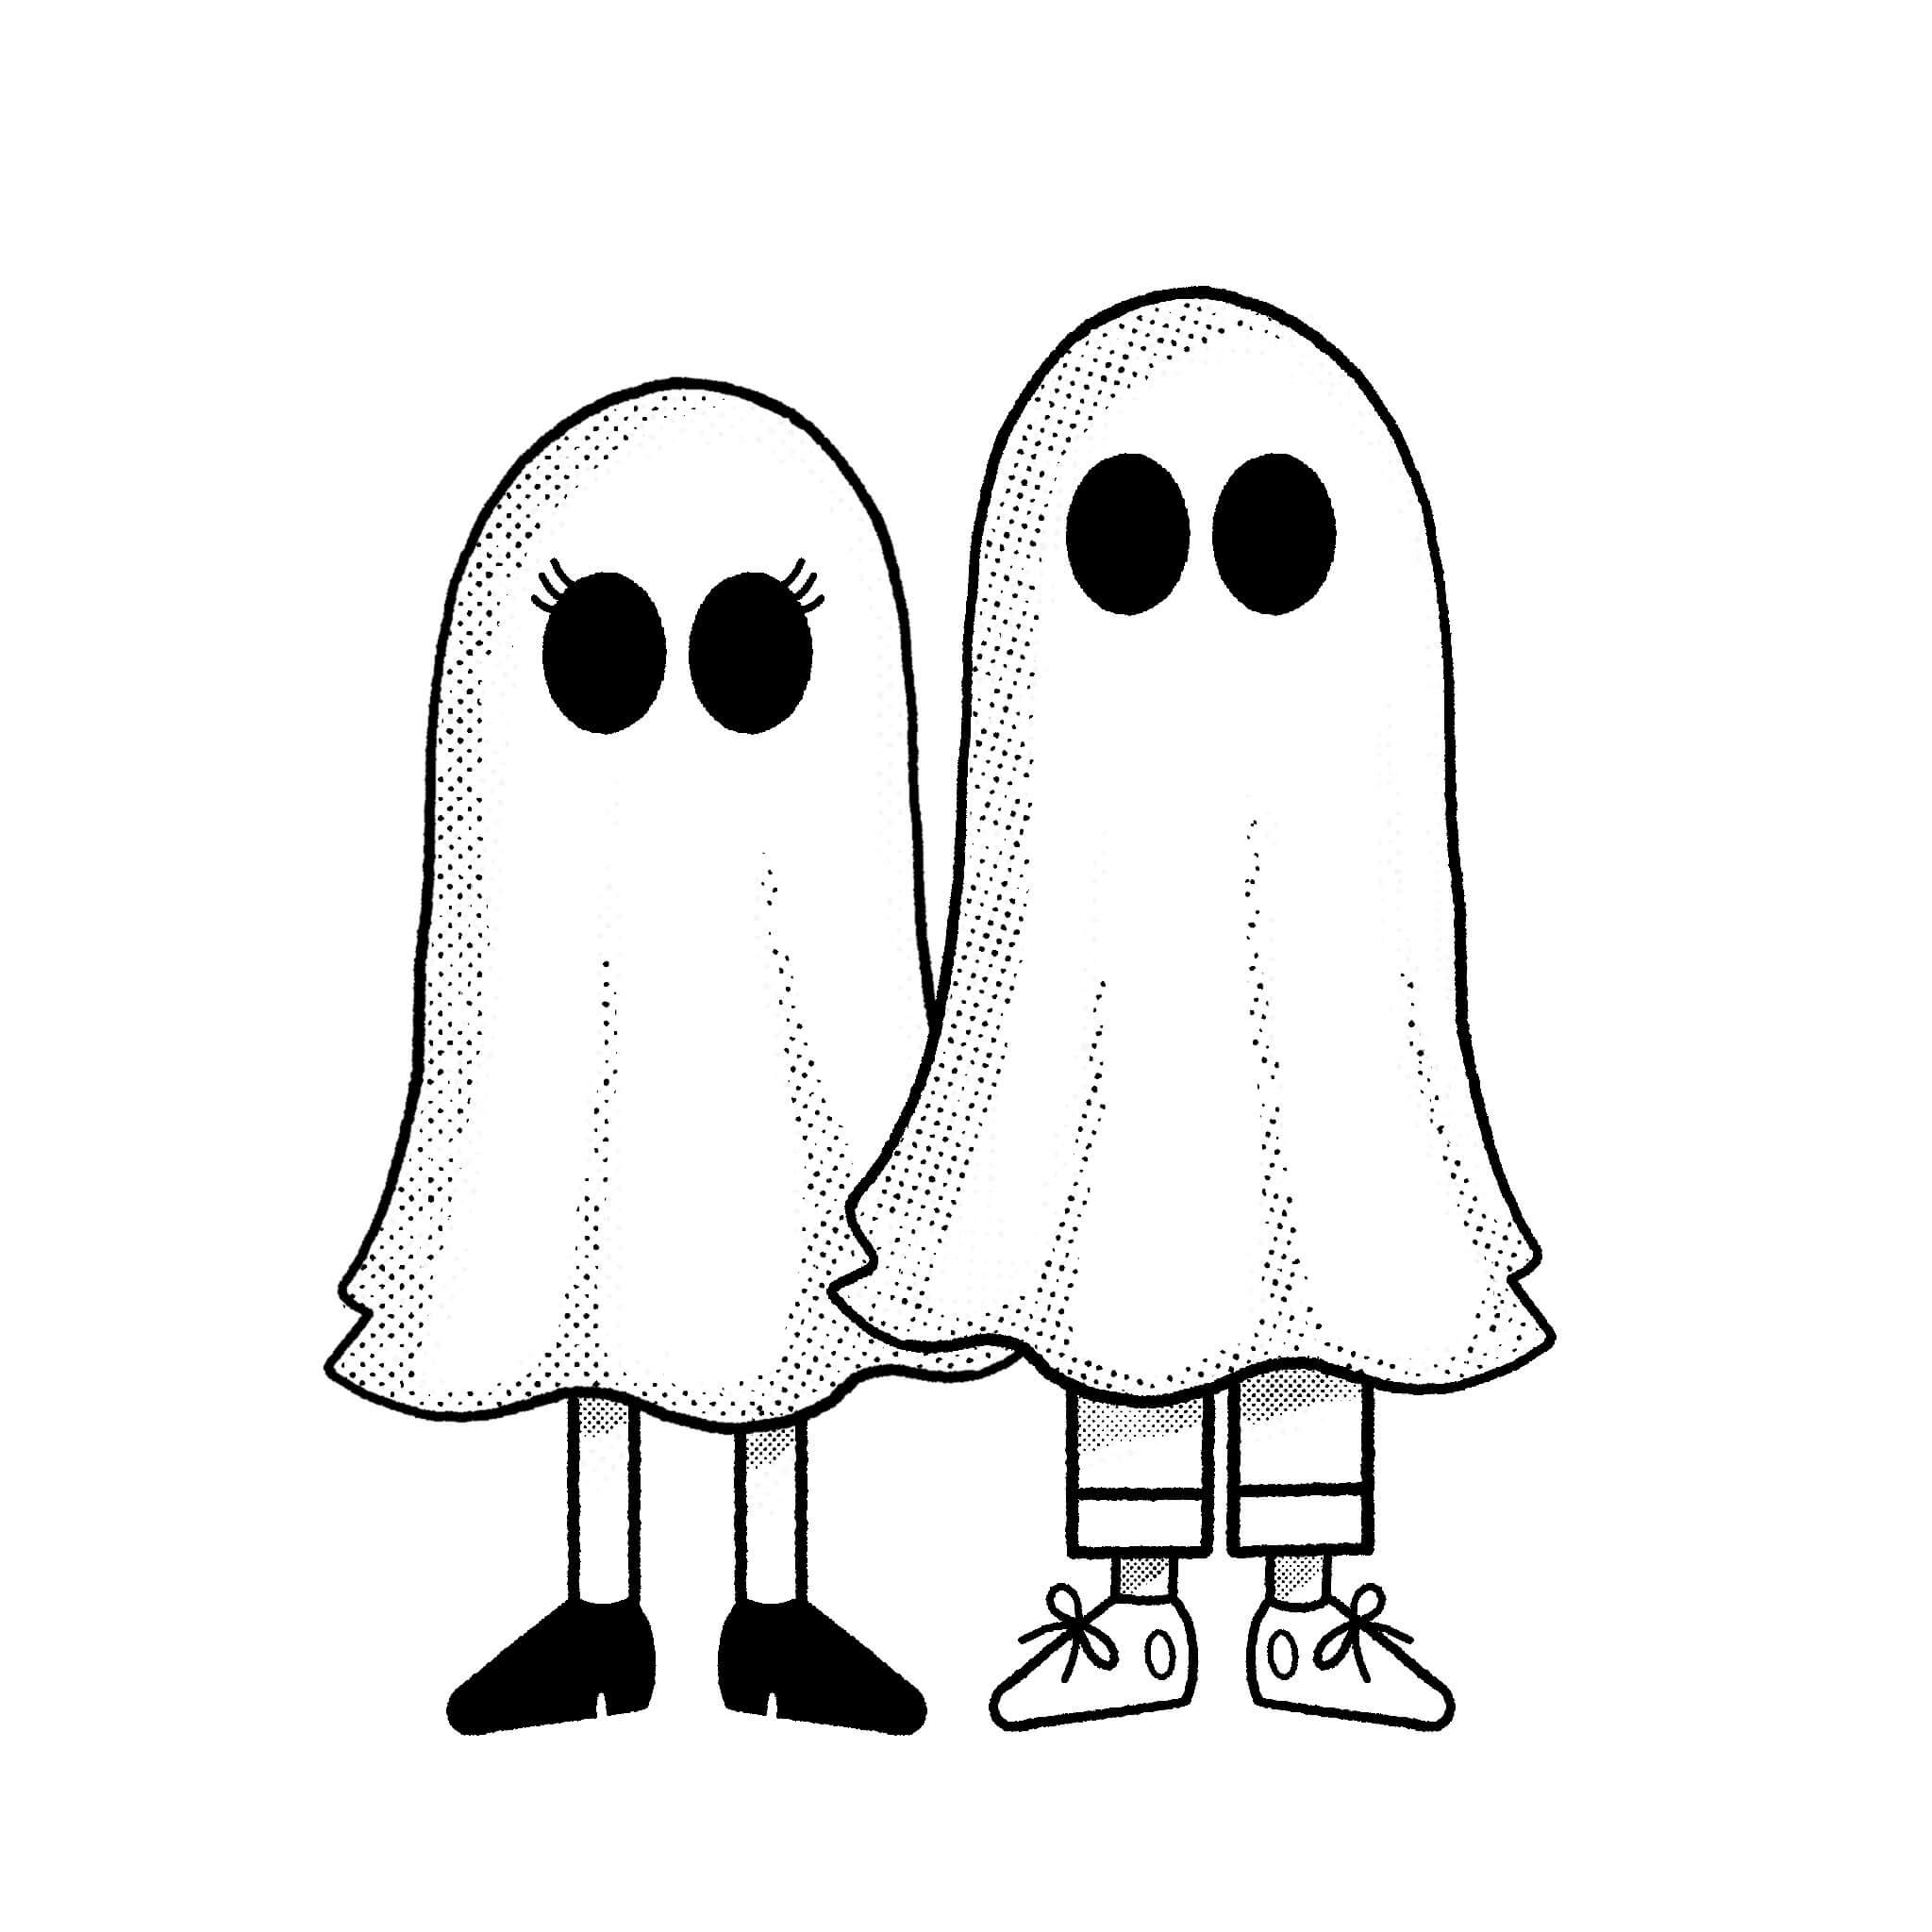 Cartoon ghost illustration of Brandon and Missy